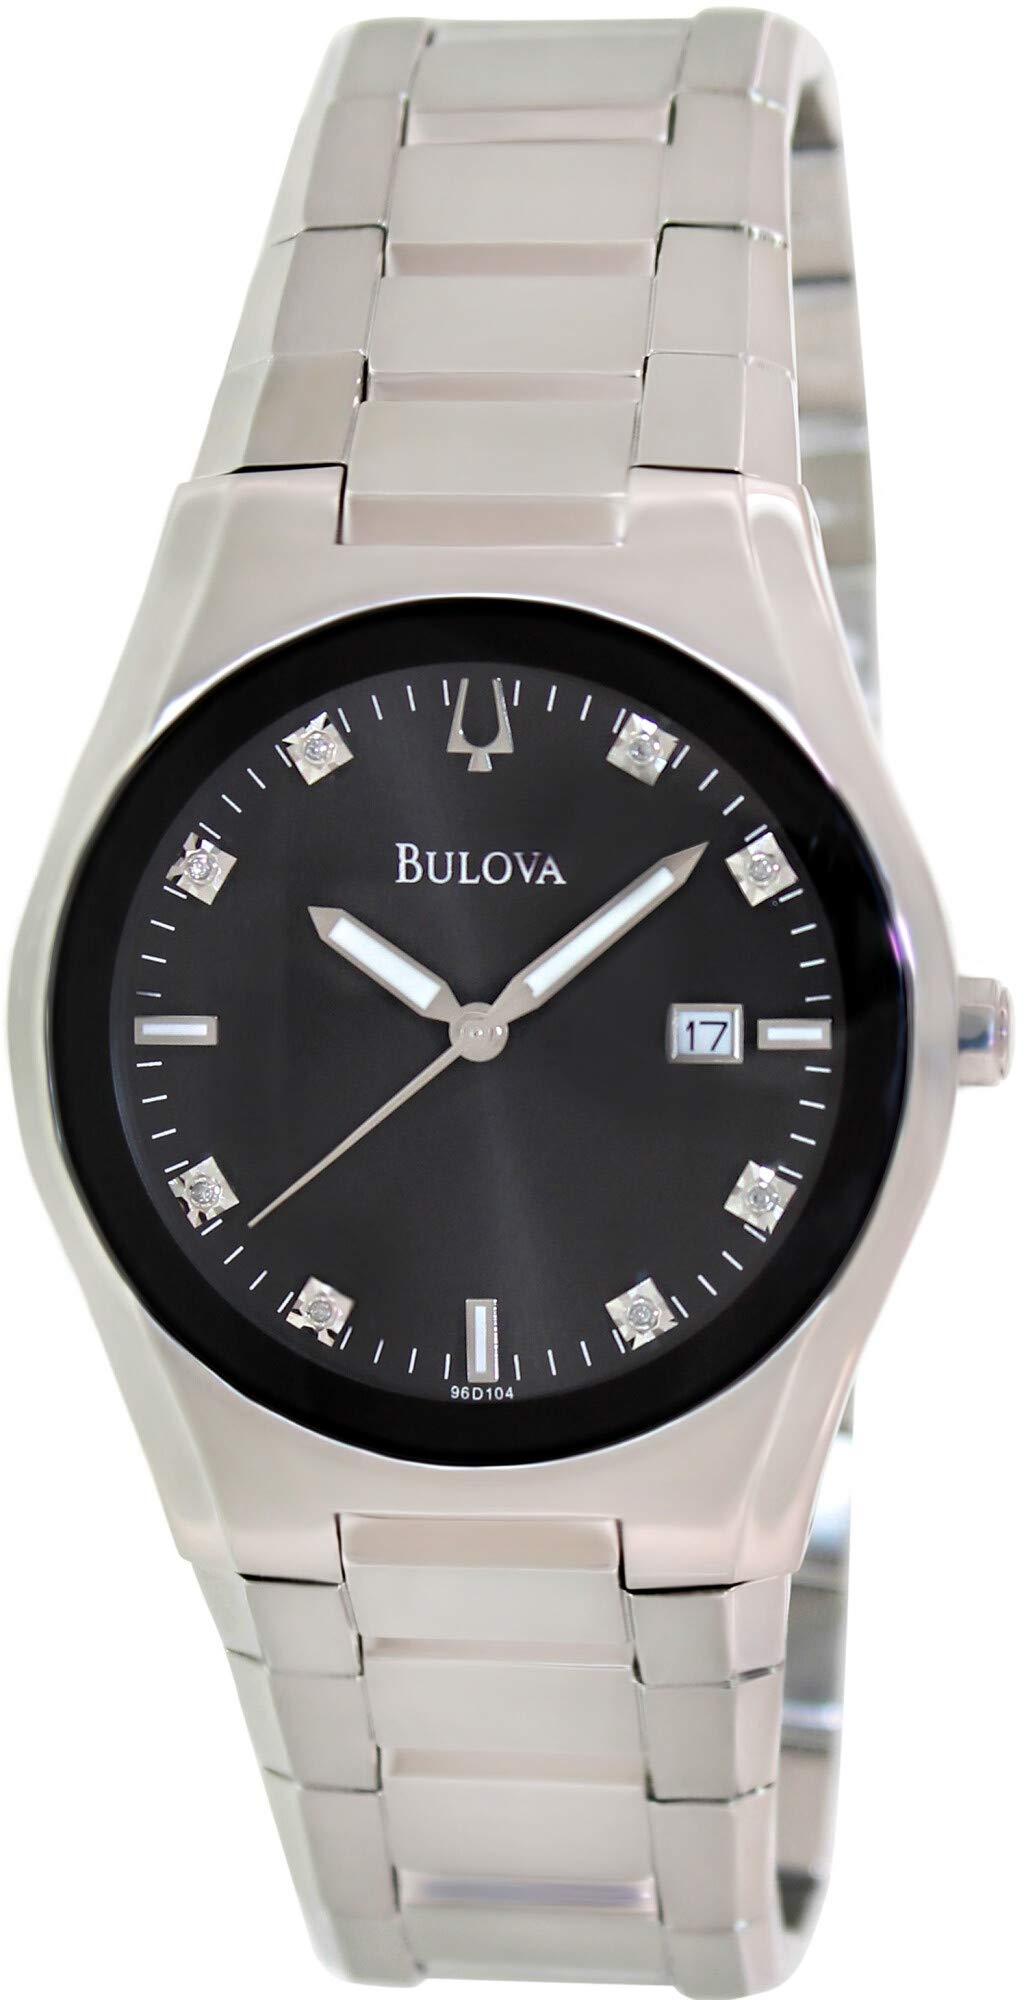 Bulova Men's 96D104 Black Dial 8 Diamonds Bracelet Watch